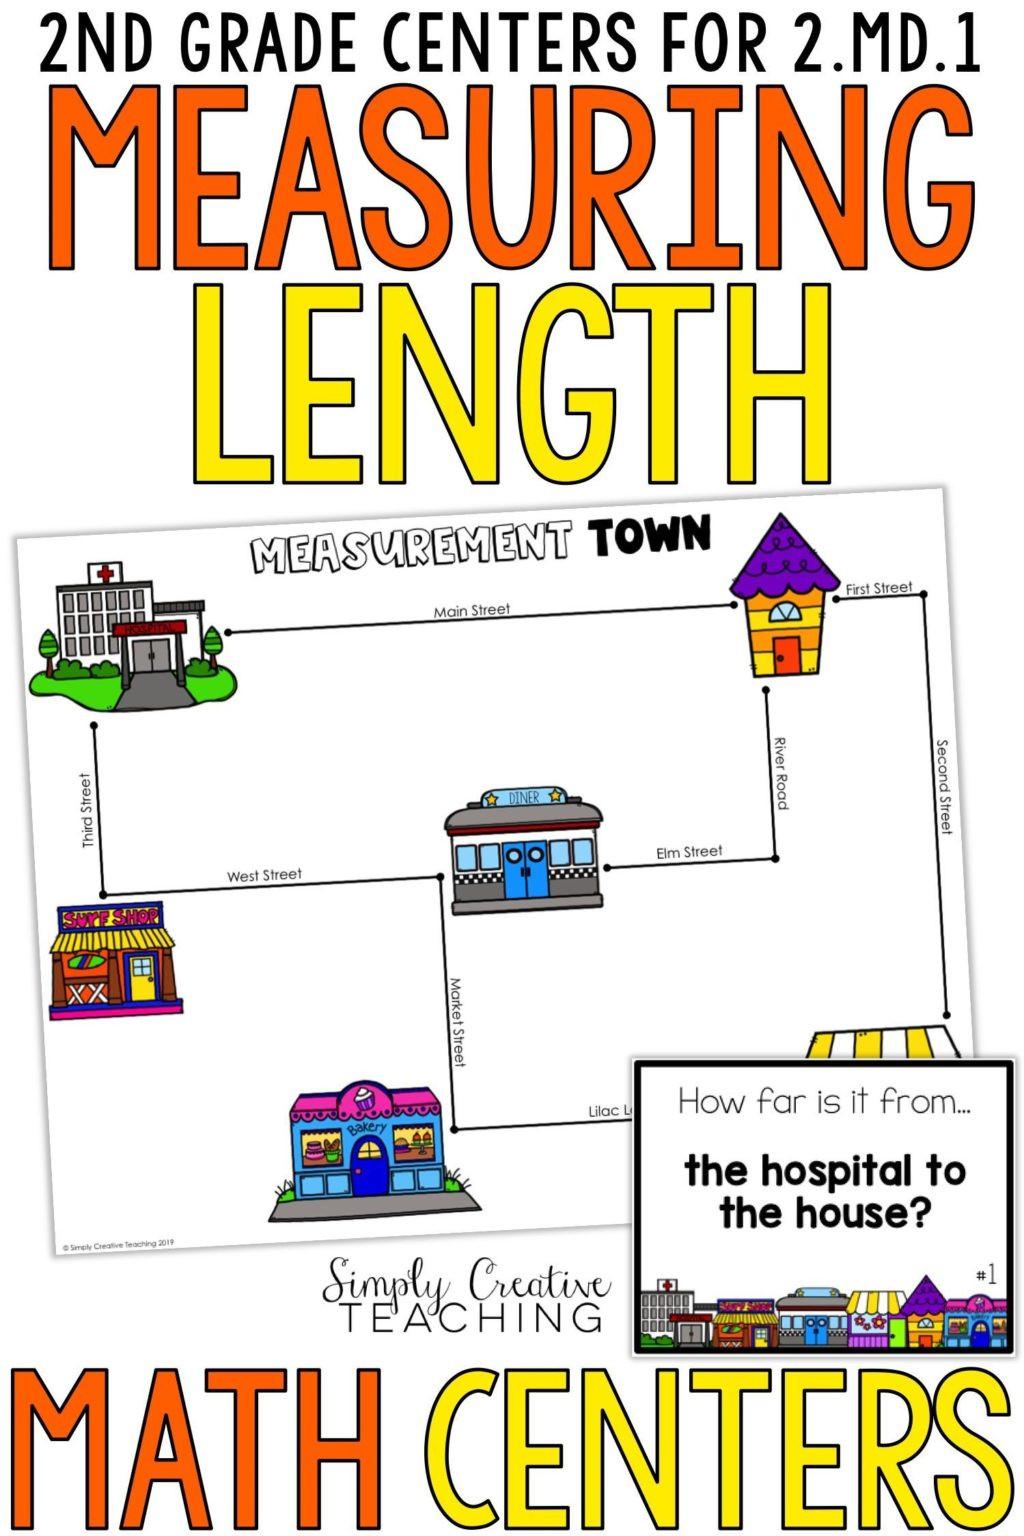 Reading A Metric Ruler Worksheet Worksheet 2nd Grade Measurement Centers for Md Second Math